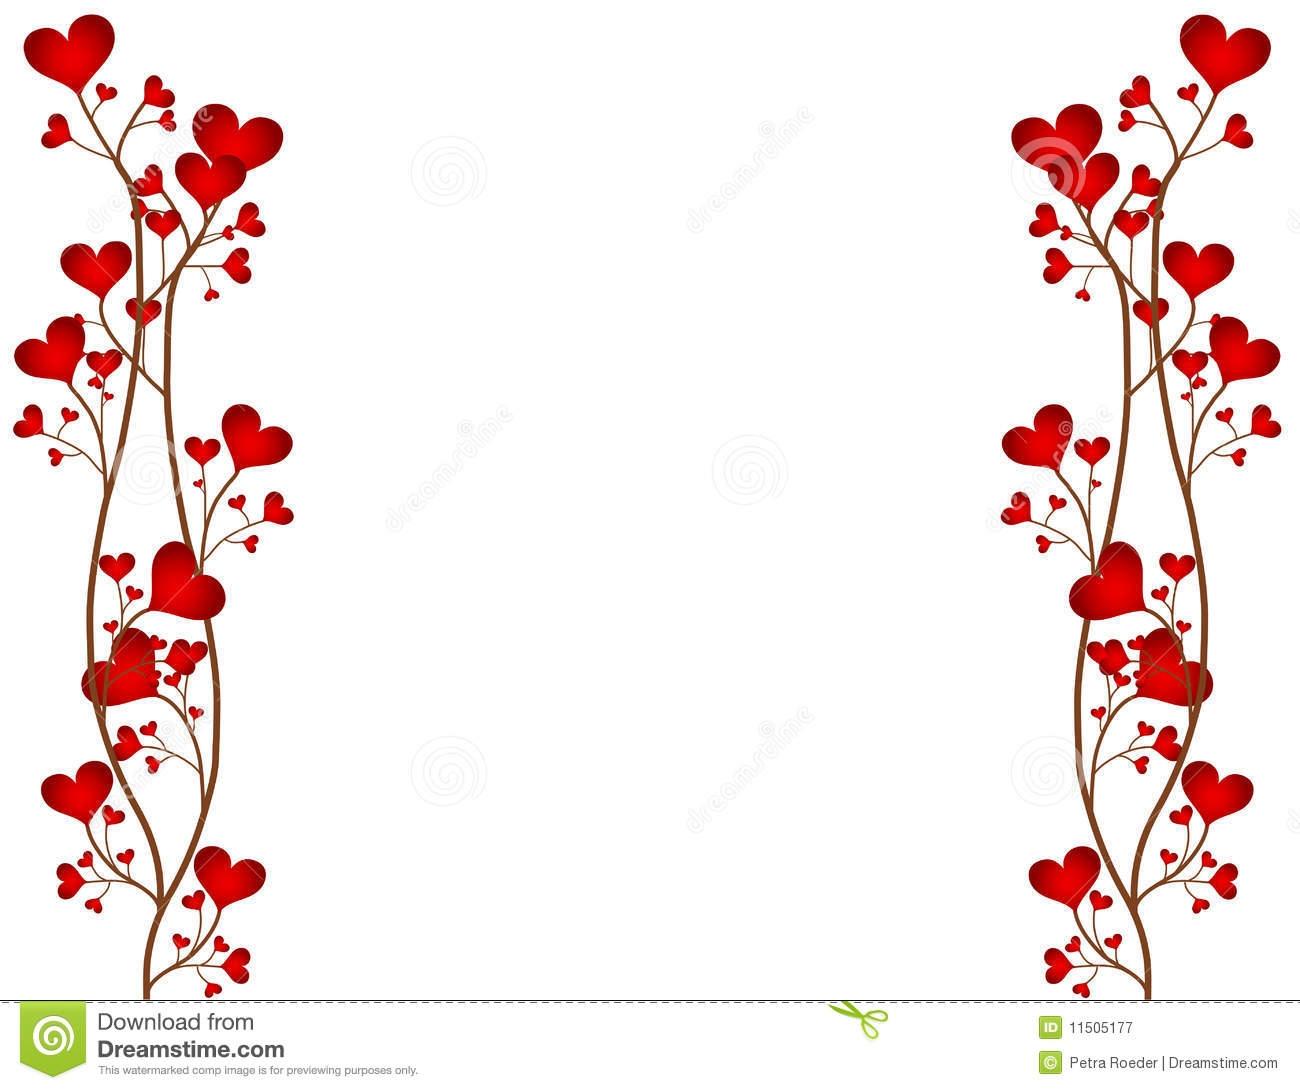 Bingkai Love Wwwpixsharkcom Images Galleries With A